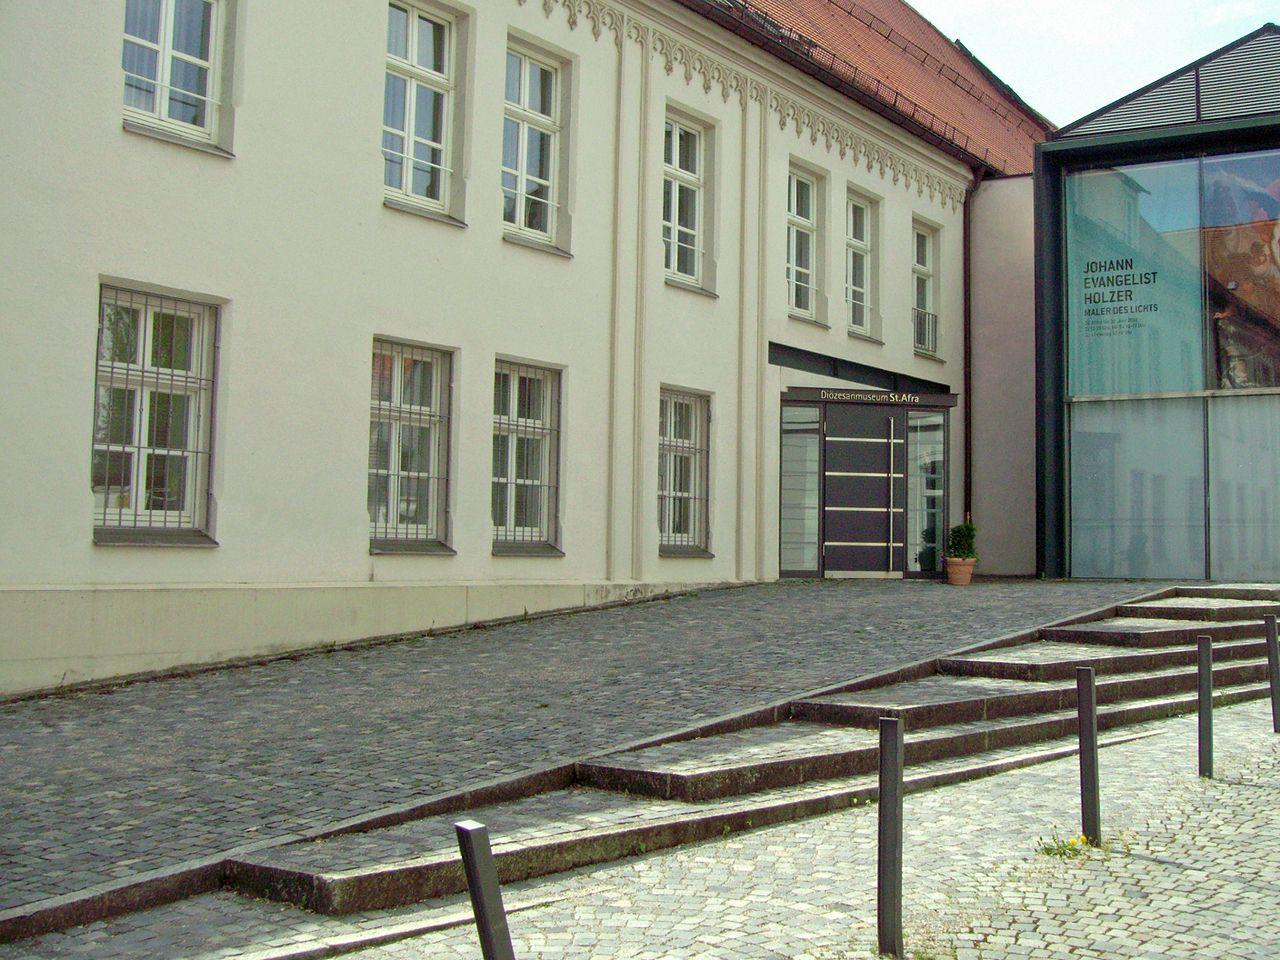 Bild Diözesanmuseum St. Afra Augsburg